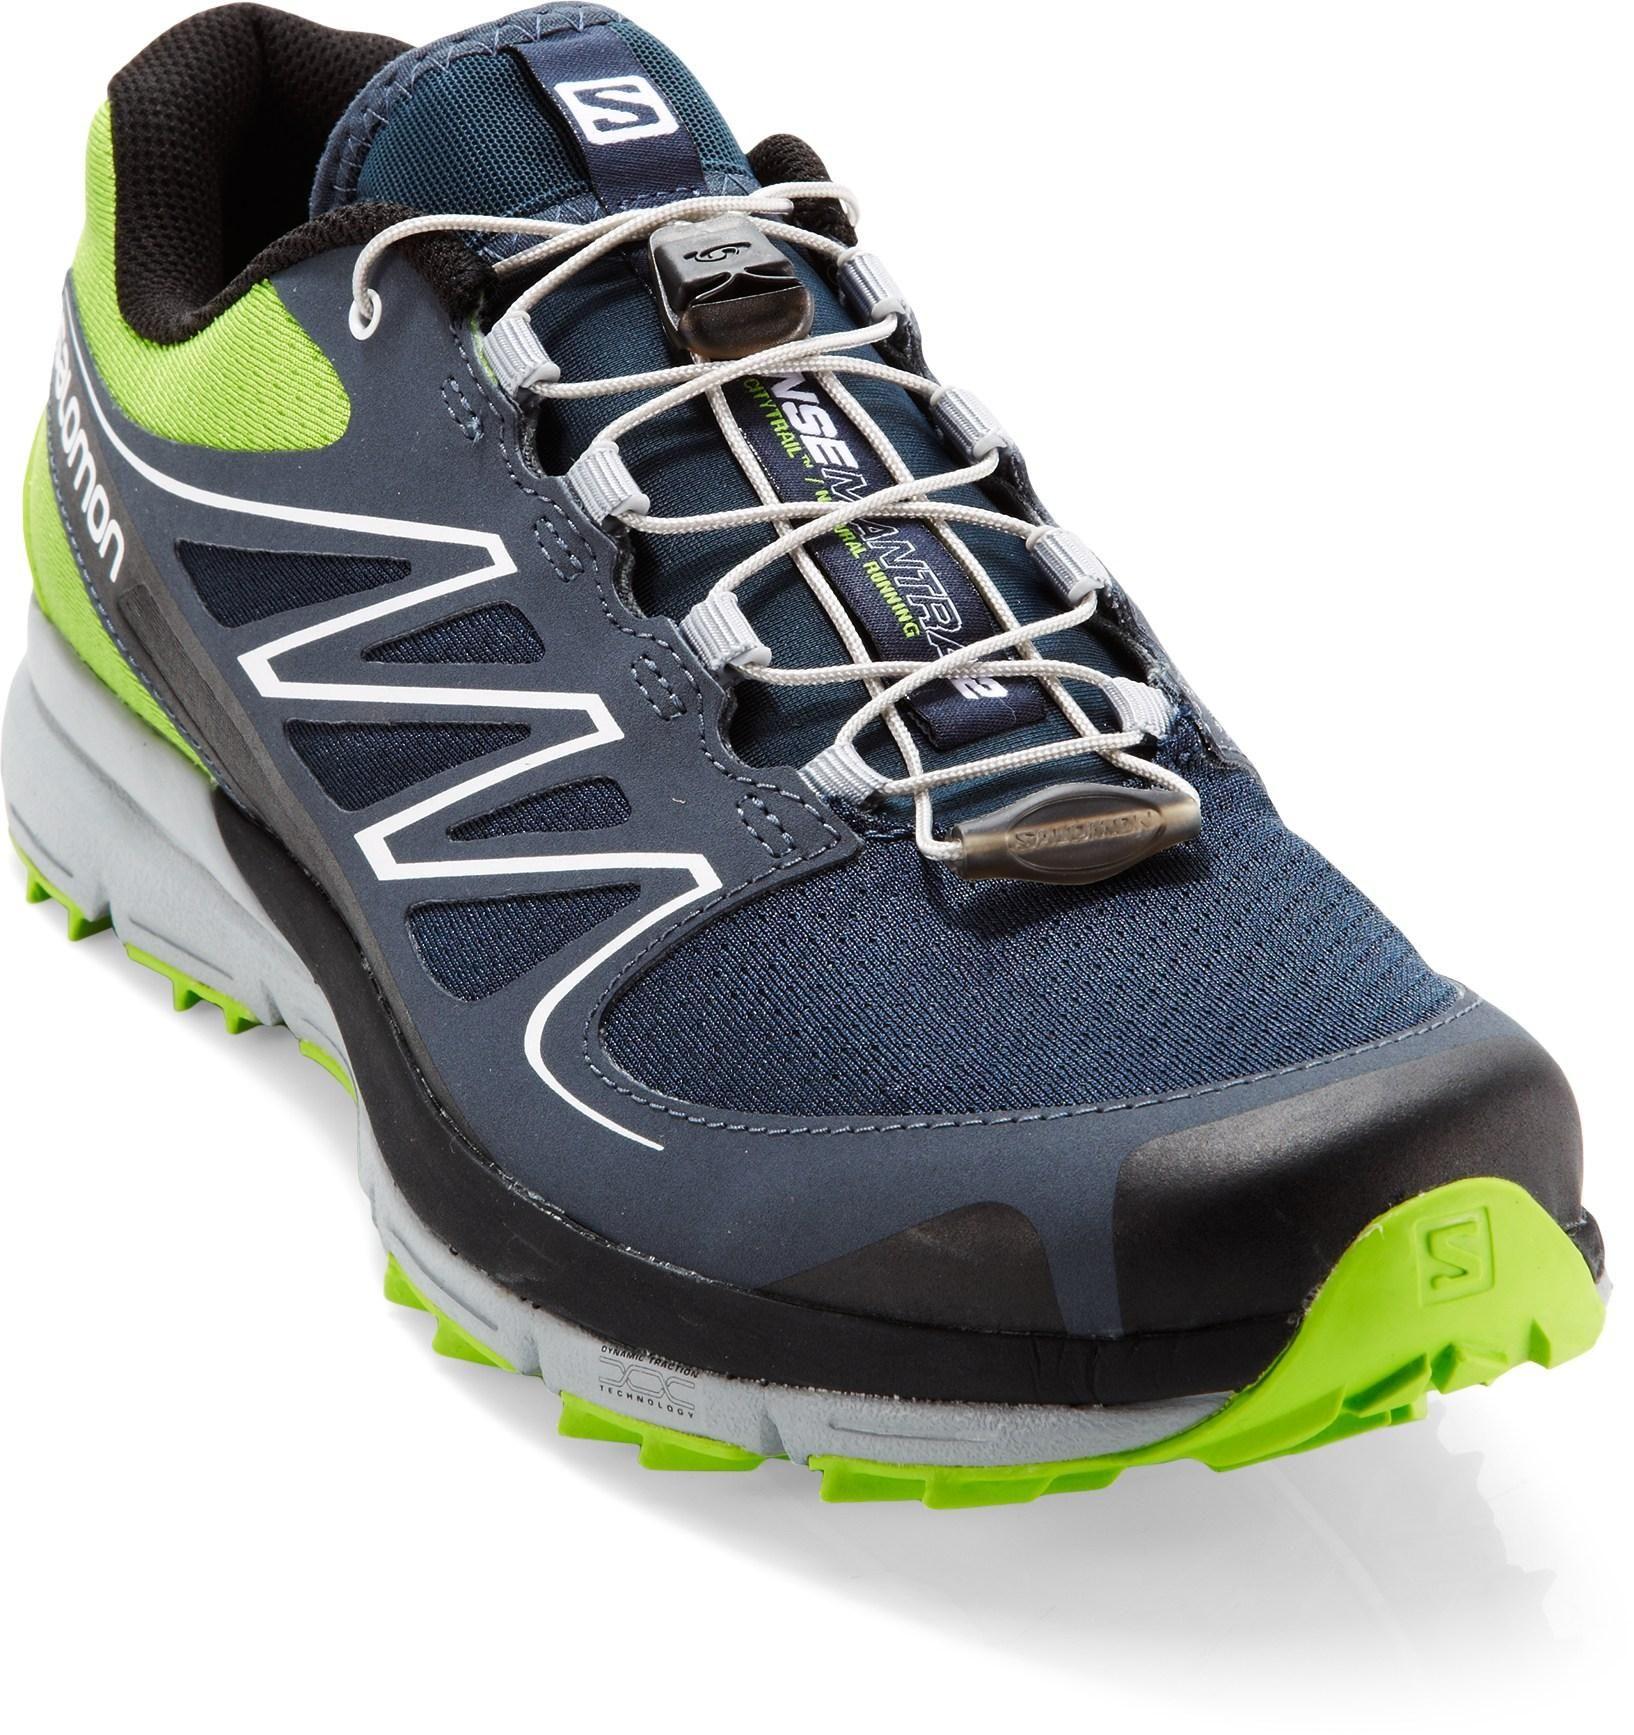 Salomon Sense Mantra 2 Trail-Running Shoes - Men's from REI on Catalog  Spree, my personal digital mall.